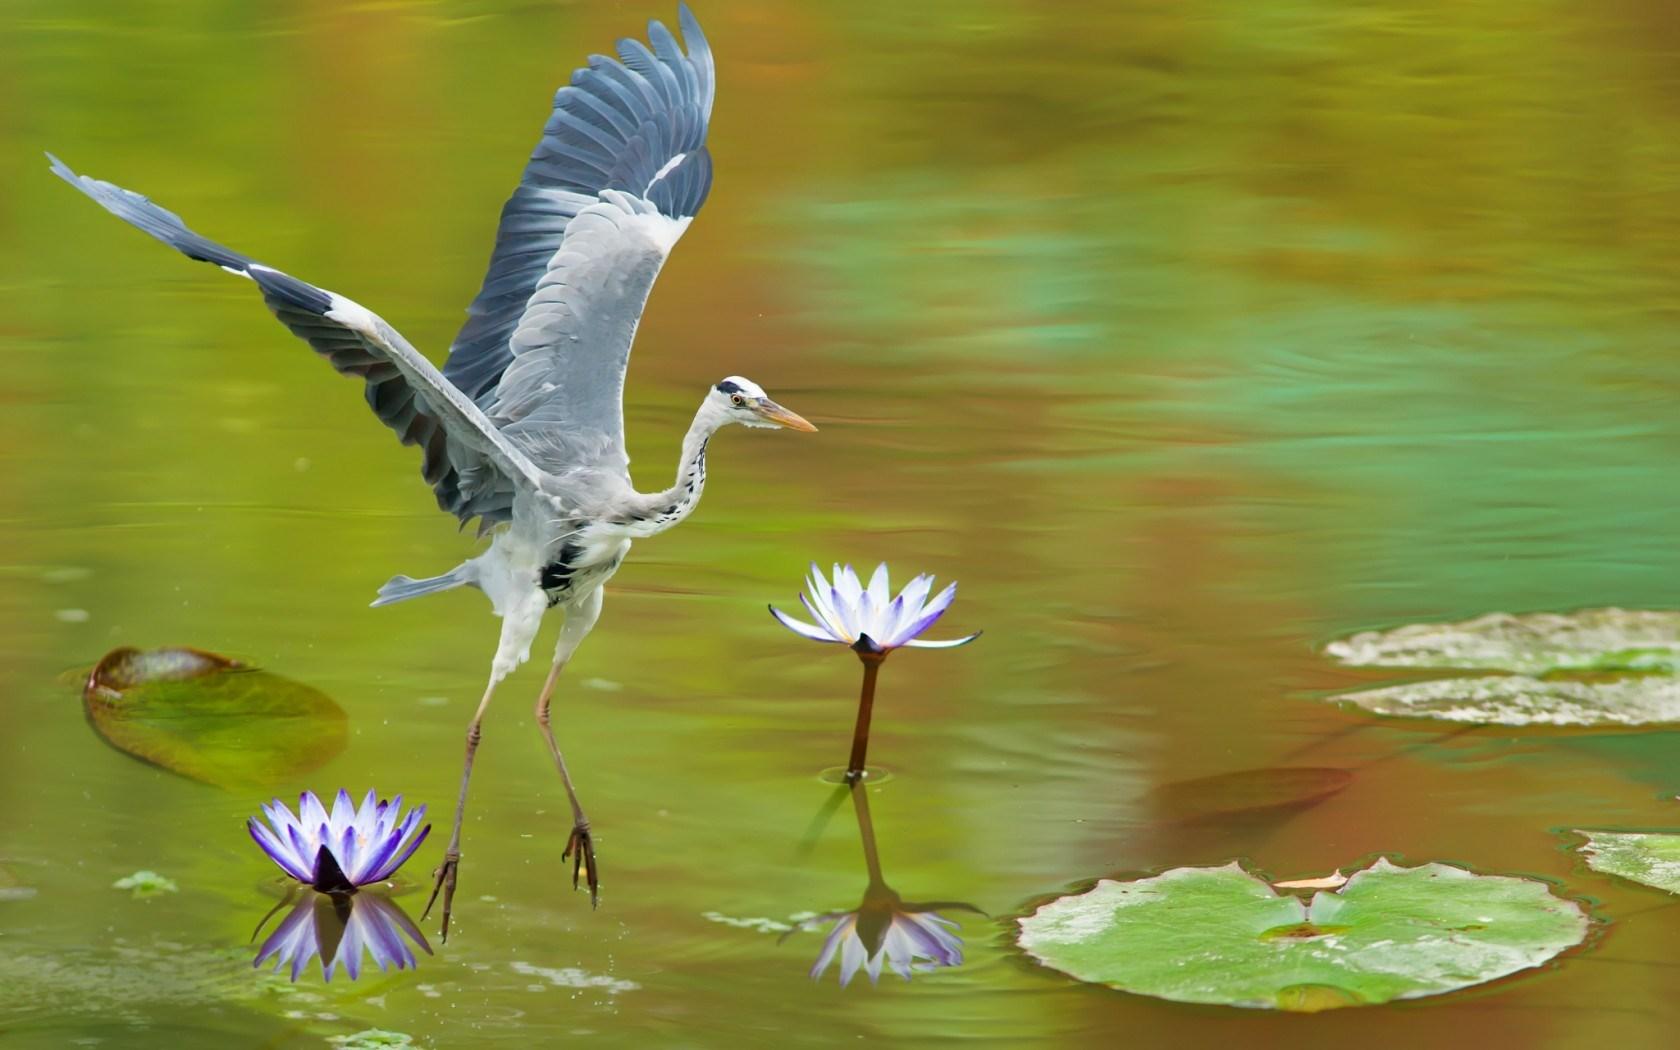 Heron Wallpaper HD Desktop Wallpapers 4k HD